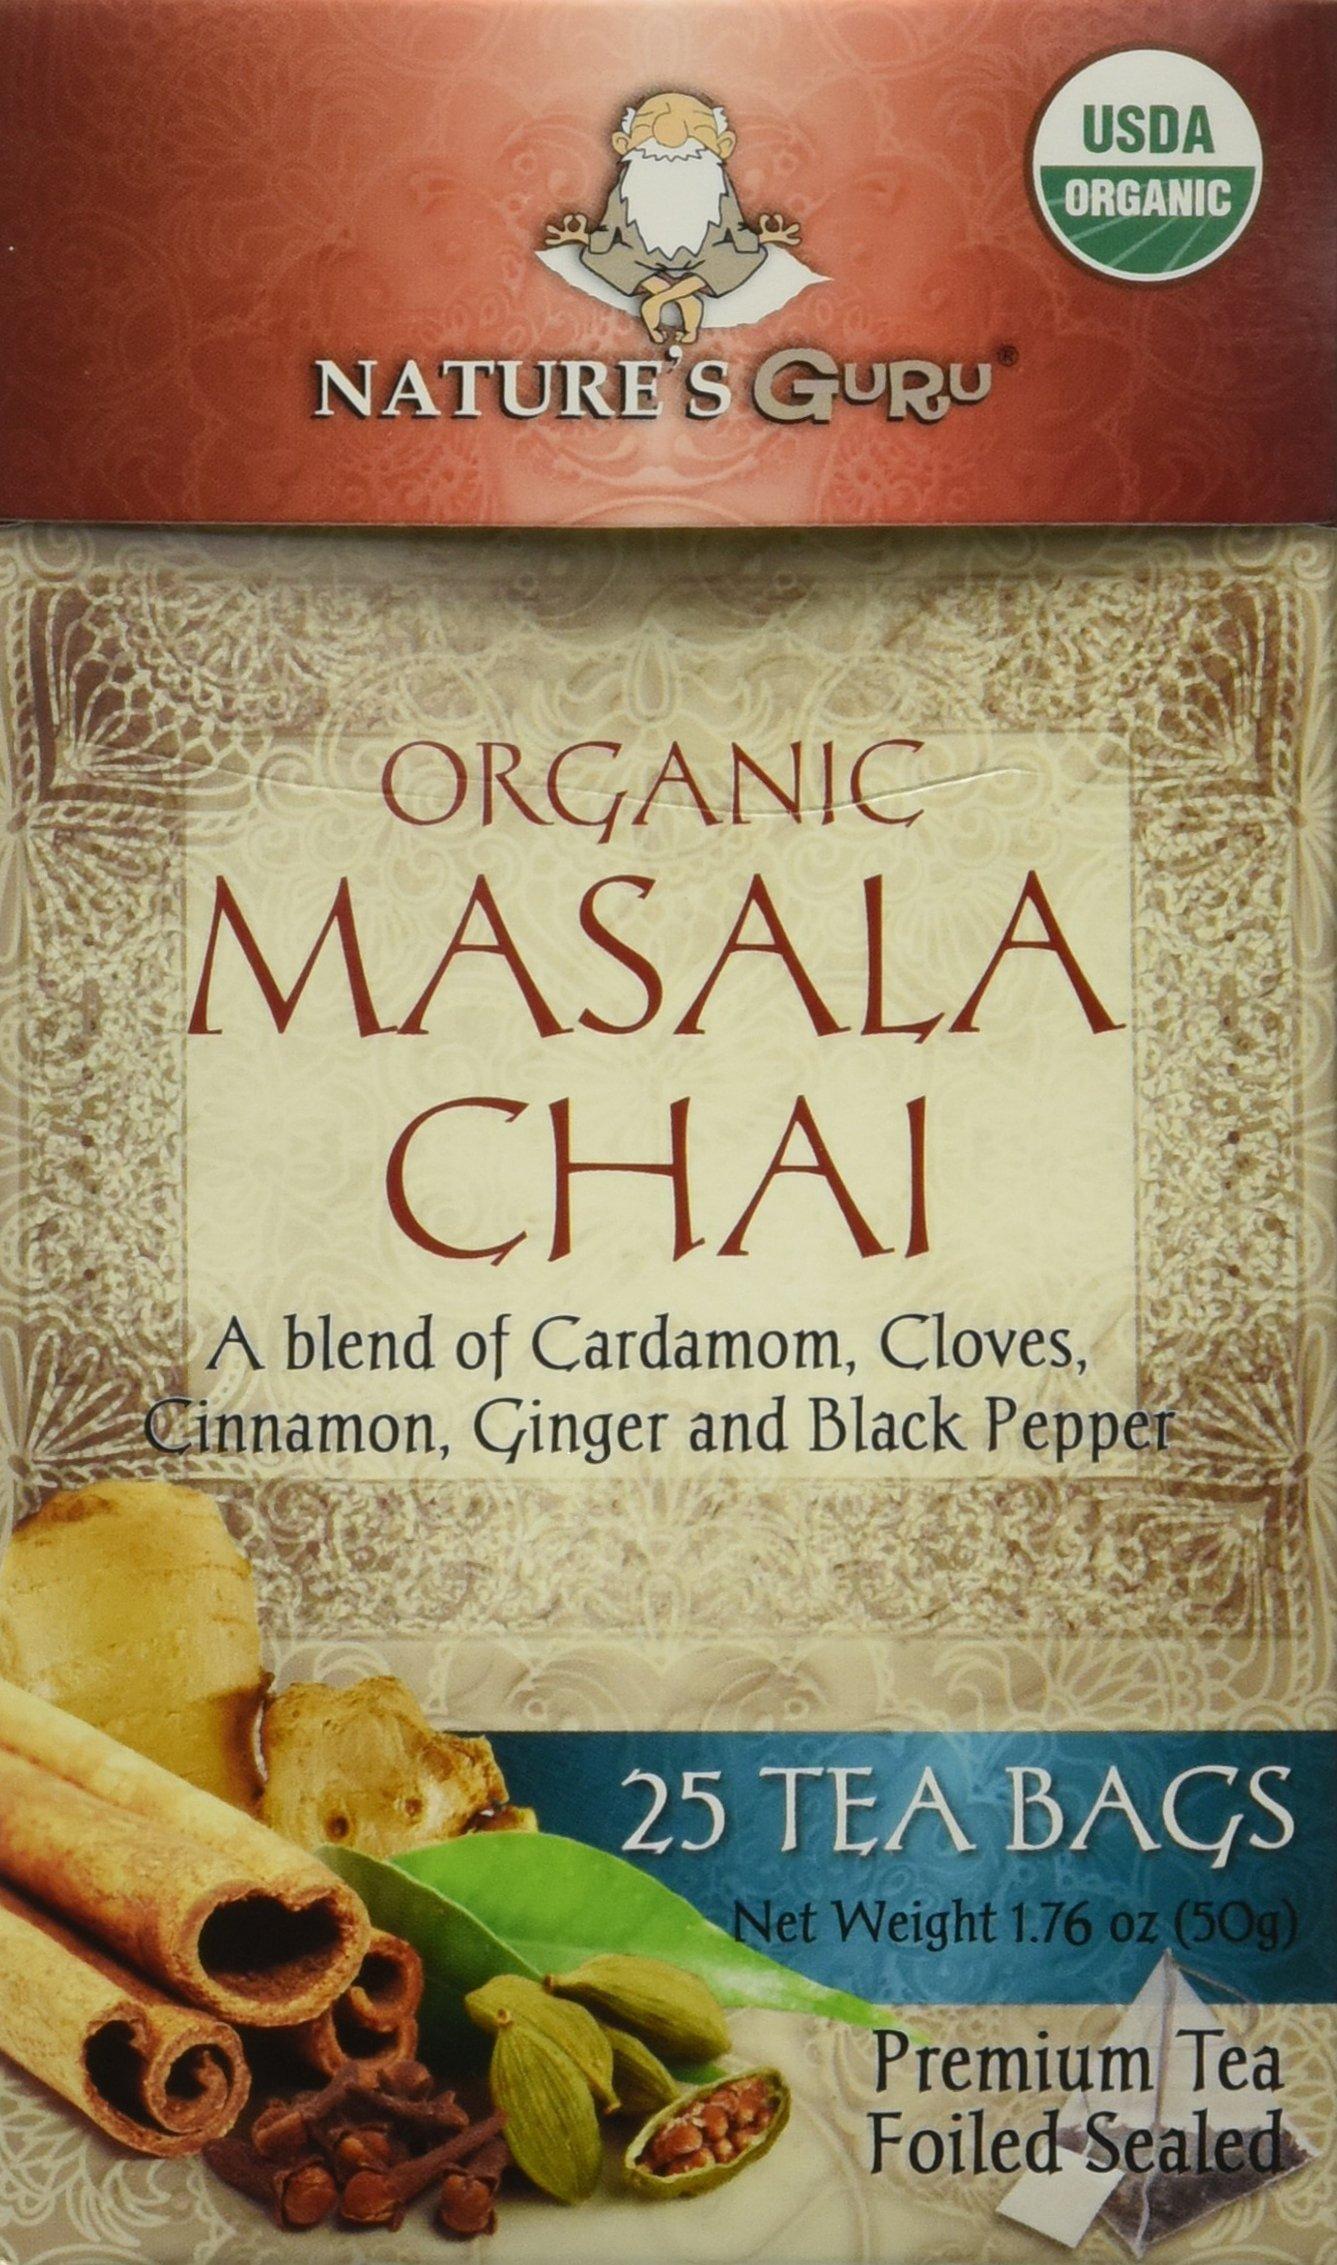 Nature's Guru Organic Whole Leaf Black Tea, Masala Chai, 25 Count Individual Tea Bags (Pack of 12)